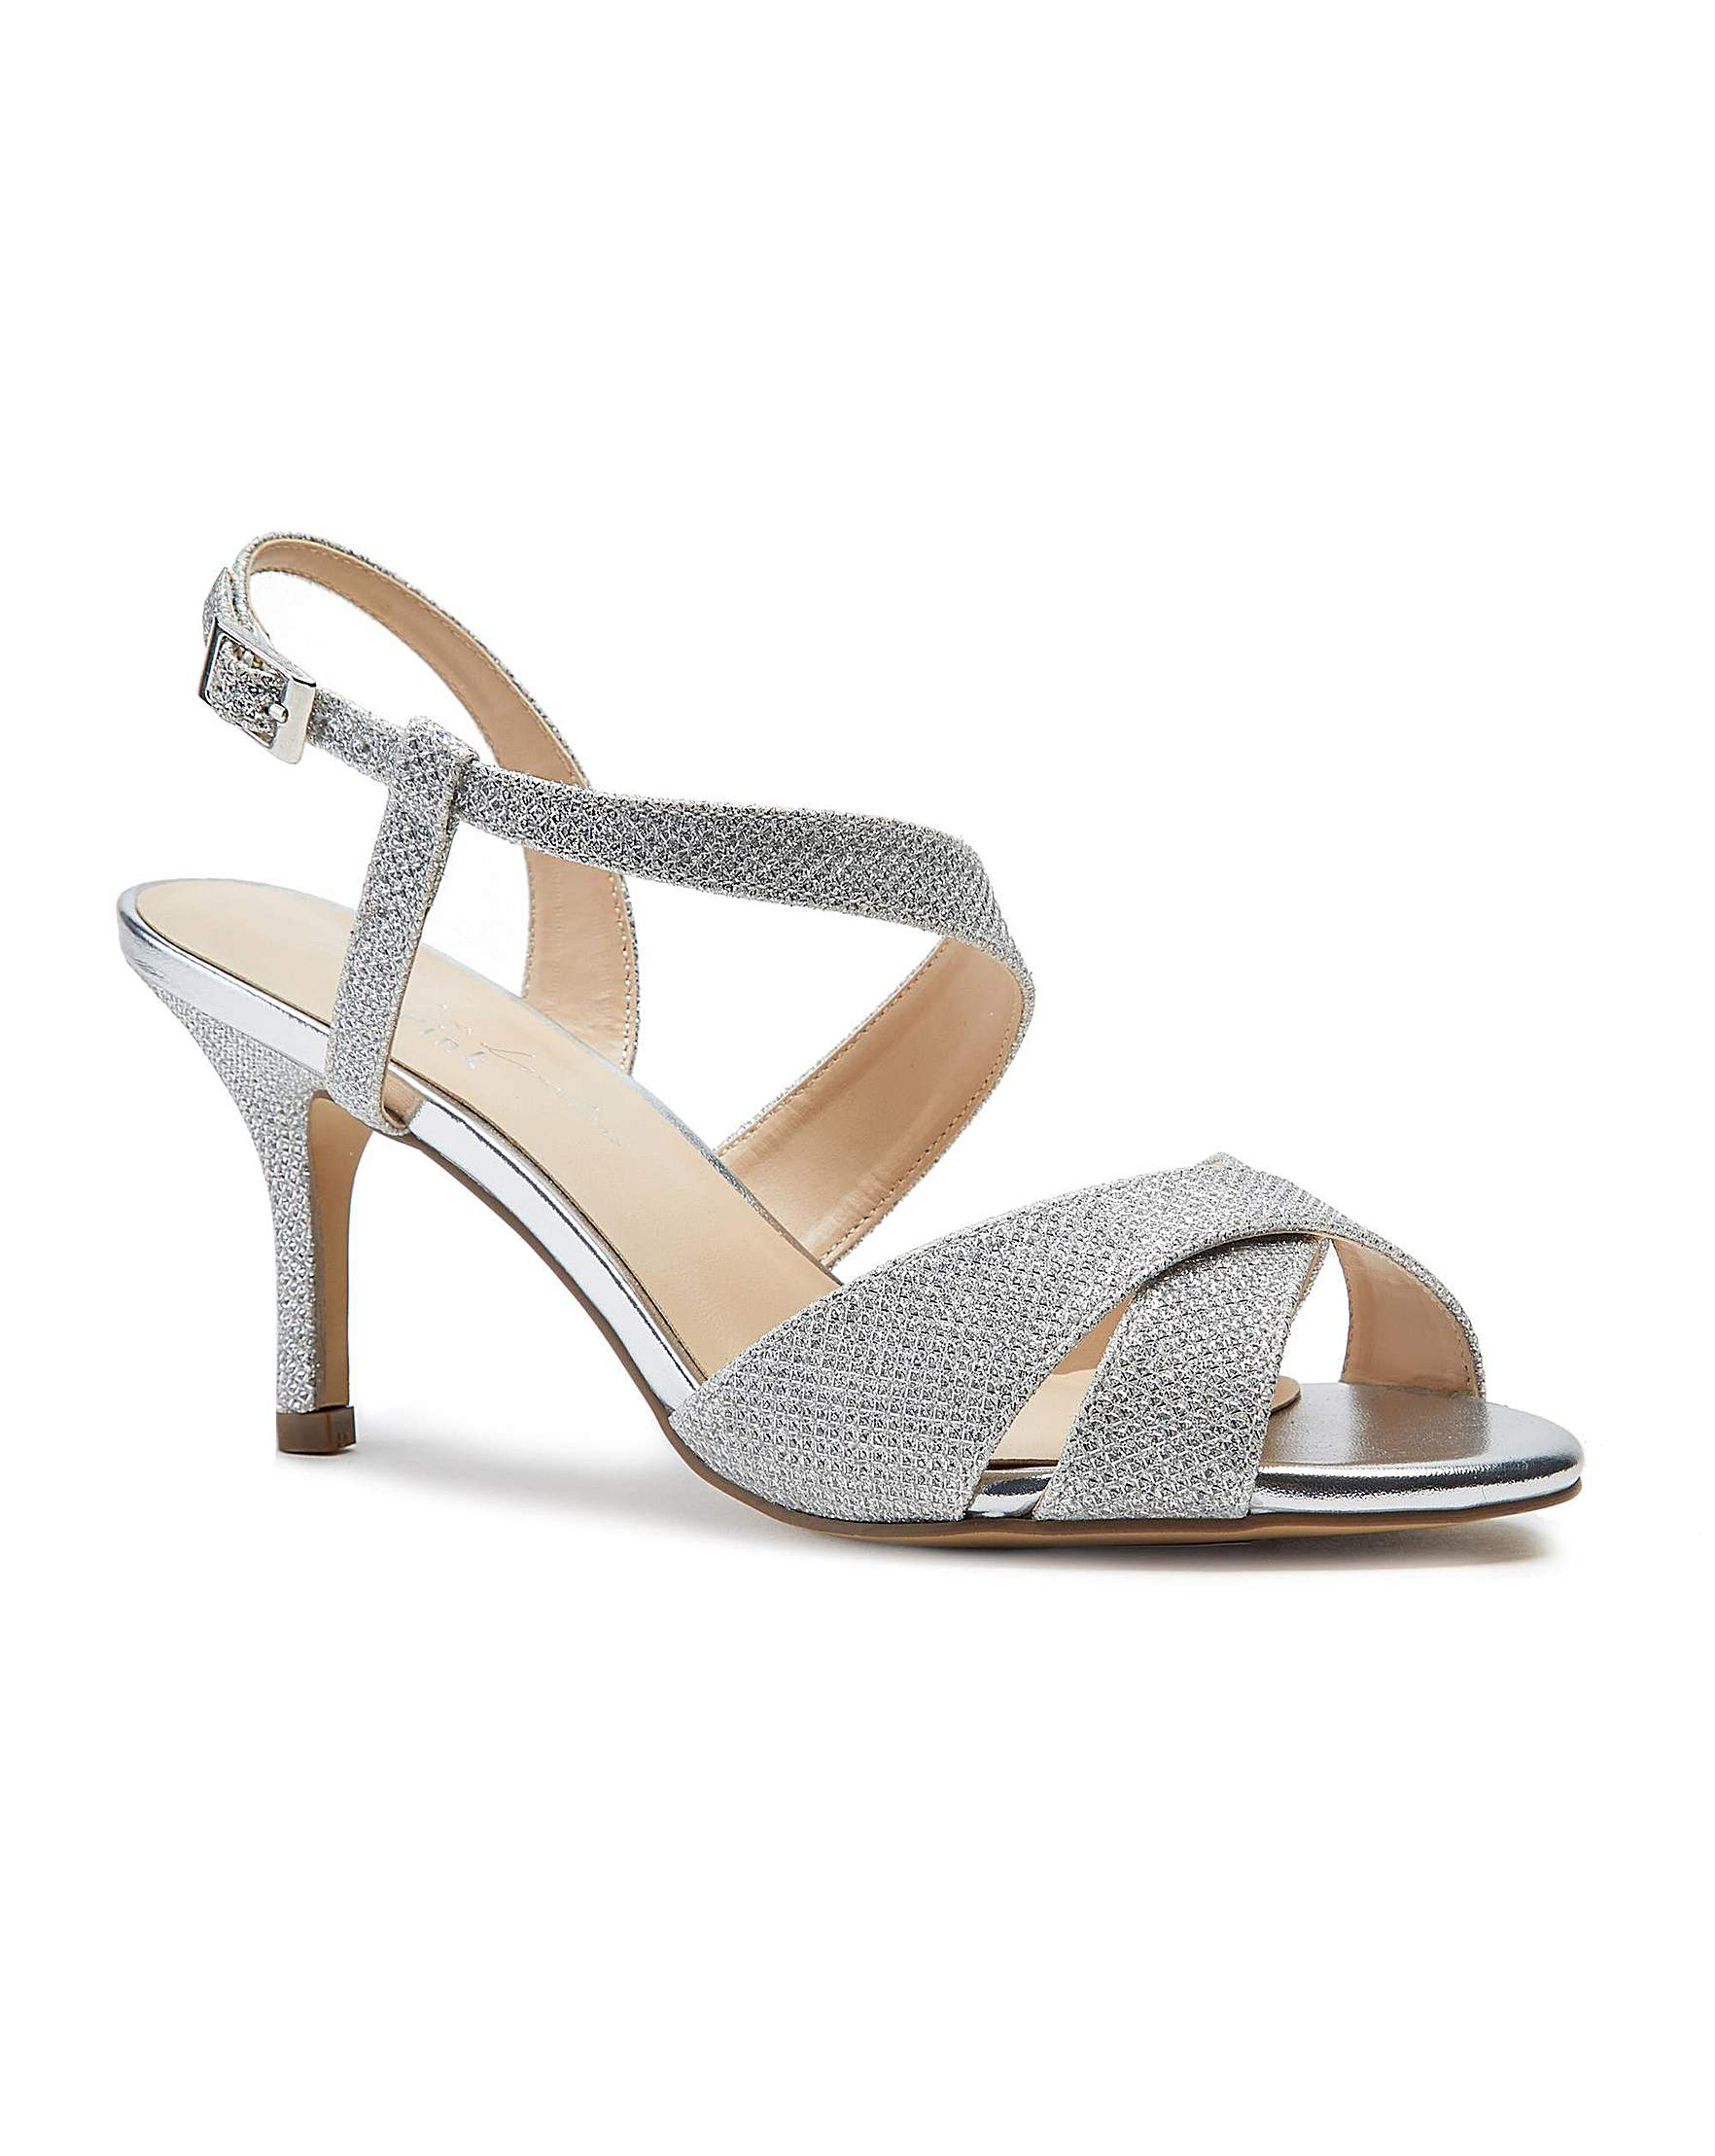 7b6f2d24106 Paradox London Hogan Wide Fit Sandals